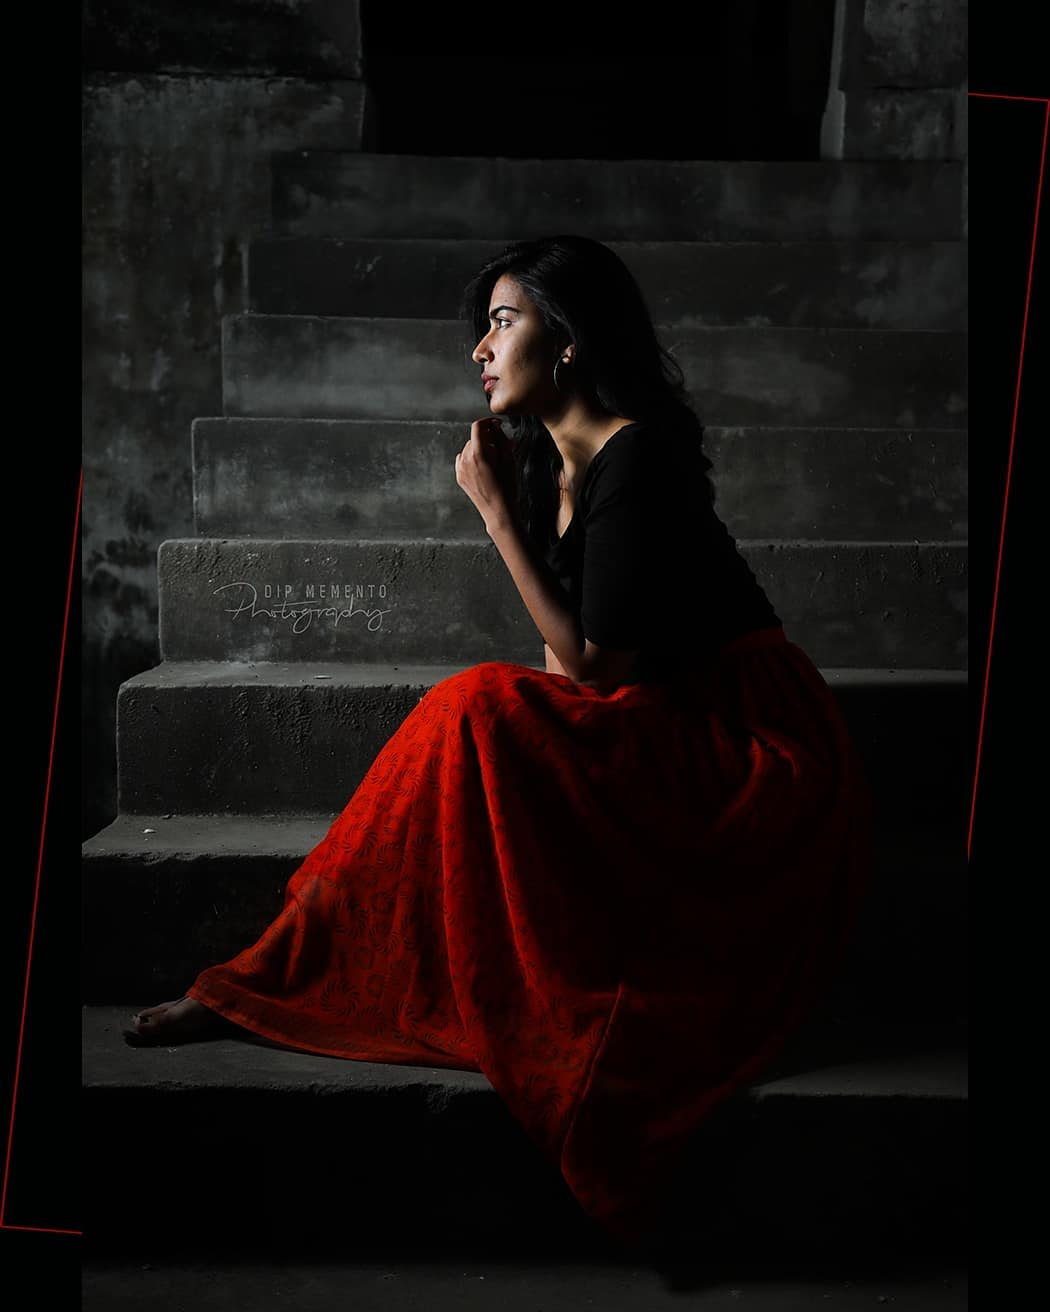 Just in that moment... . . Shoot : Fashion  @dip_memento_photography  In Frame: @komalpatel_16 . . #portraitphotography #portraitmood #portraitspg #portraitpage #vscoportrait #portait  #dipmementophotography  #ahmedabad #fashion #photographer #portraitmode #featurepalette #illgramers #portrait_mf #9924227745 #pursuitofportraits #portrait_shots #moodyportrait #portraitmag #portrait_planet #resourcemag #portraitamazing #portraits_life #portraitfeed #pulsefilm #streetxstory #nextvisualportraits #feature_portraits #portrait_